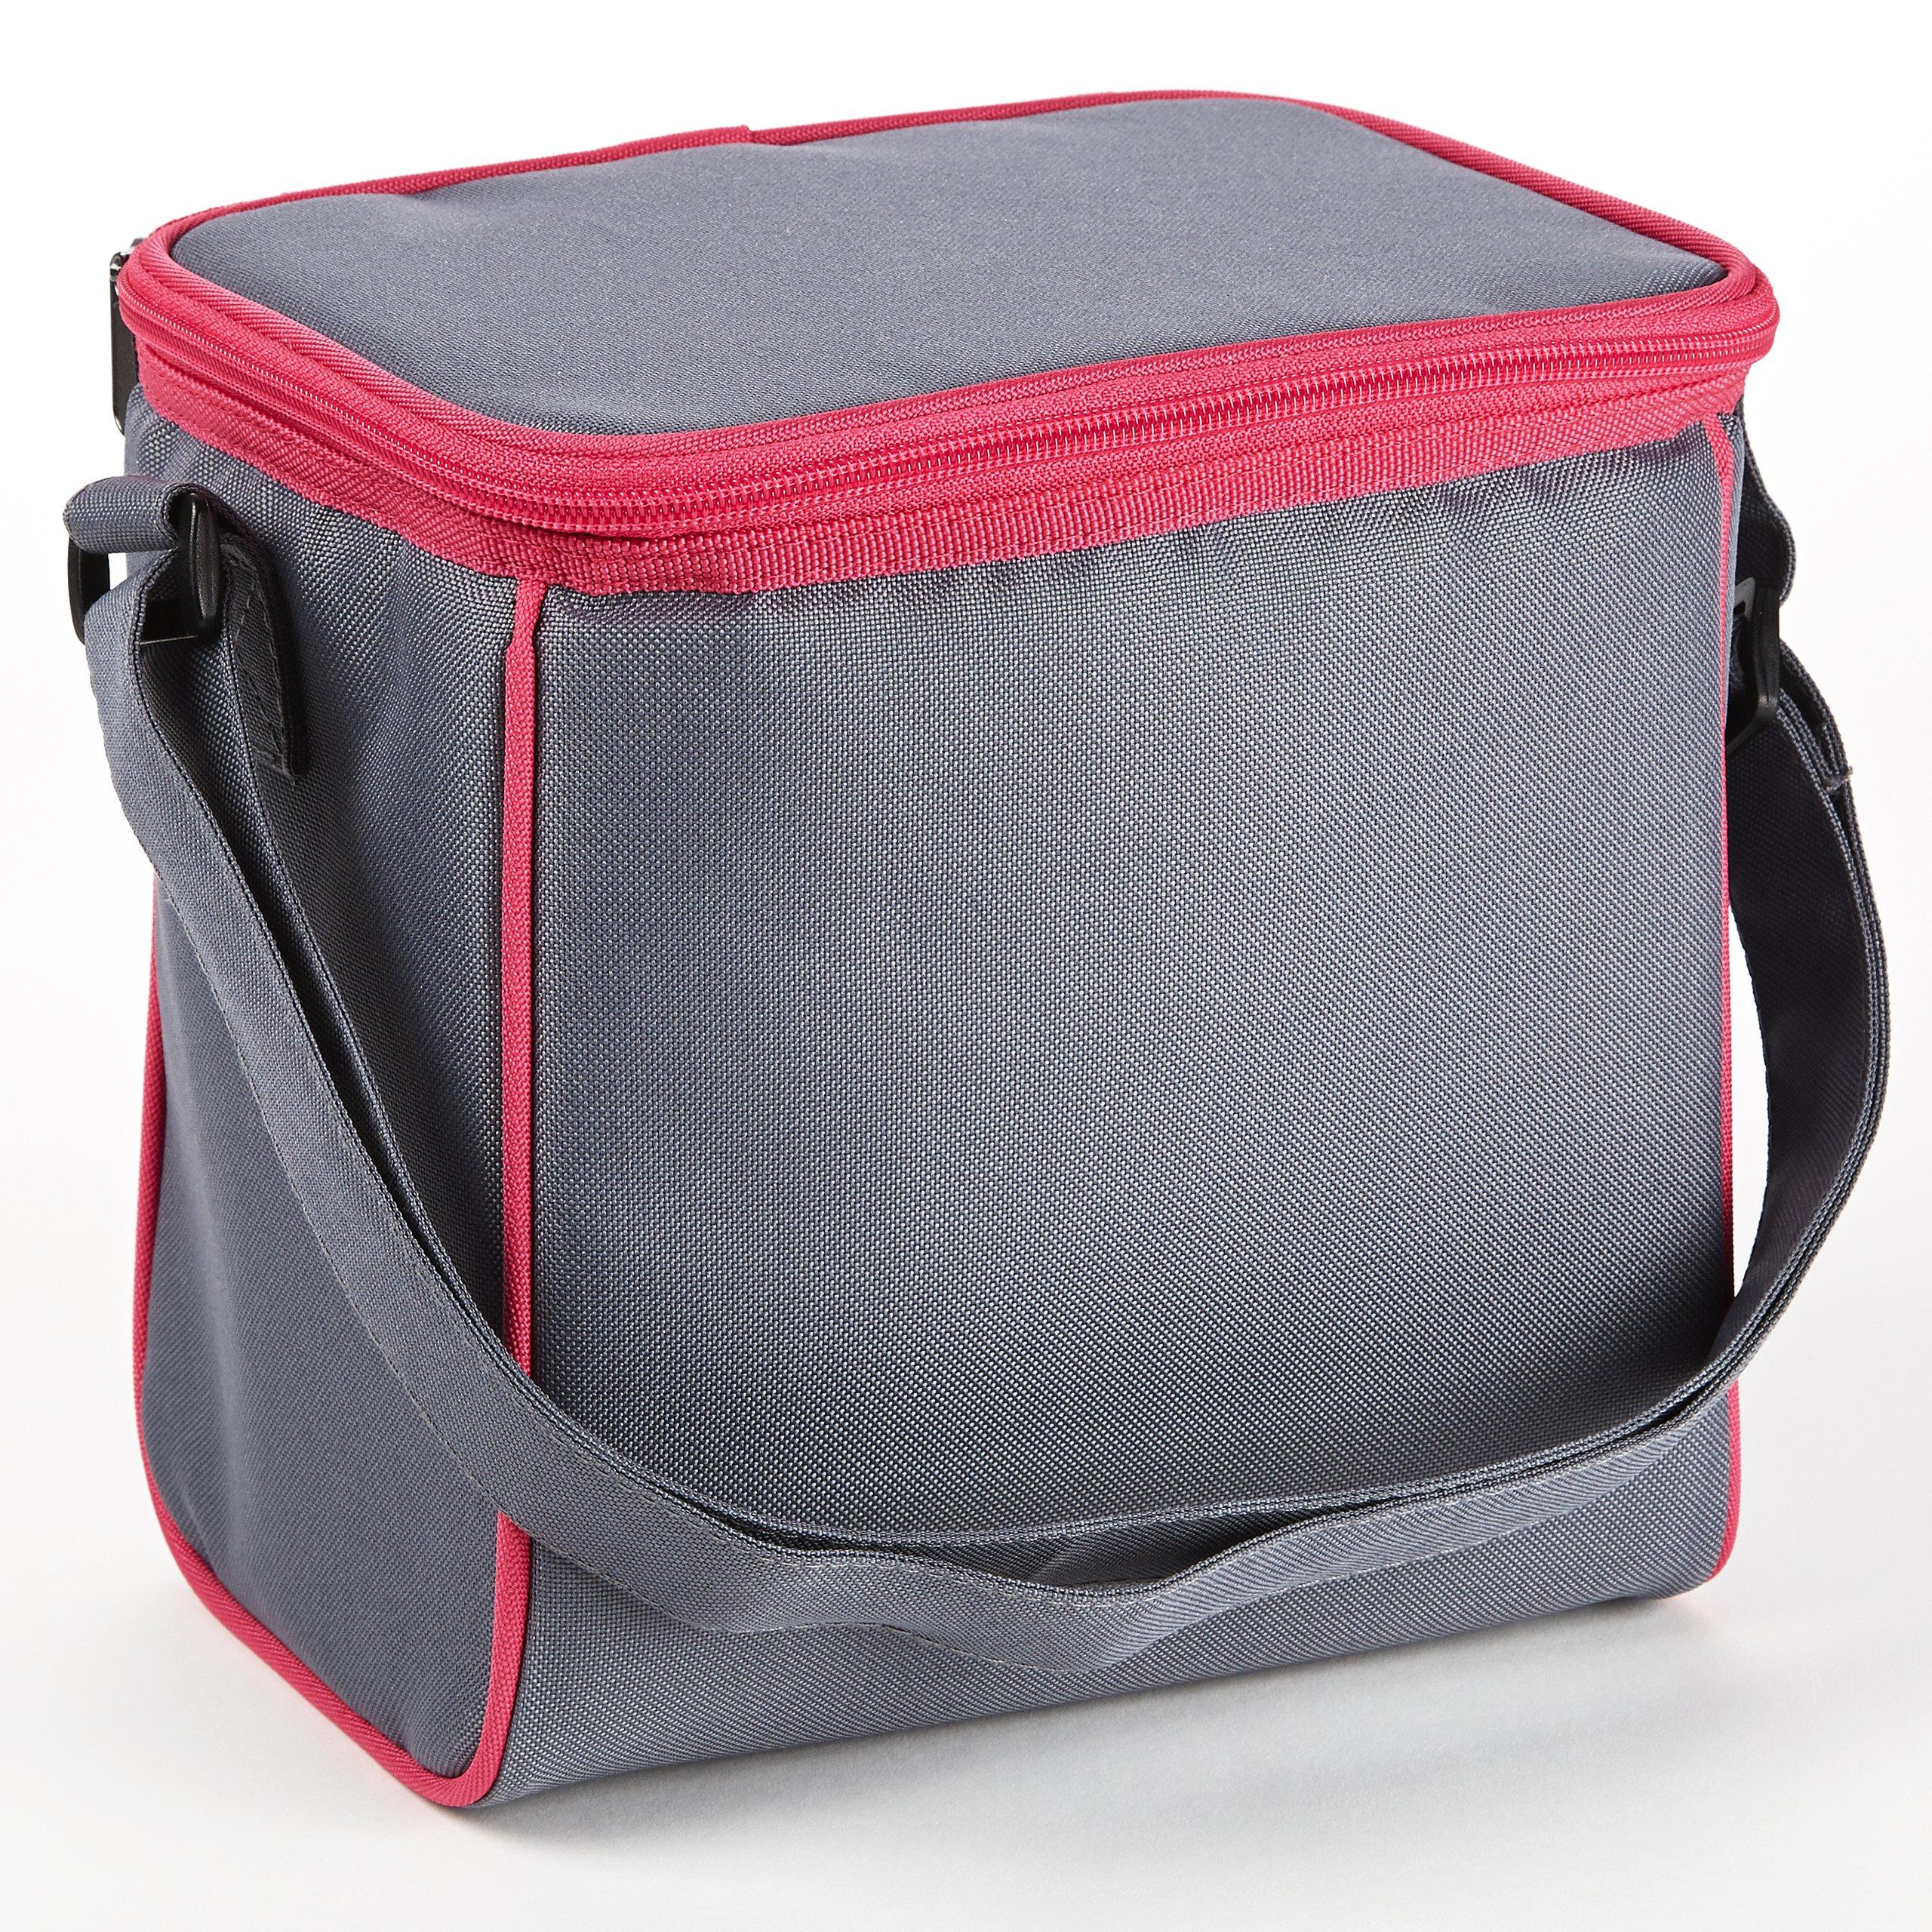 Fit & Fresh Insulated Baby Bottle Cooler Bag with Adjustable Shoulder Strap, 6 Bottle Capacity, Gray & Pink